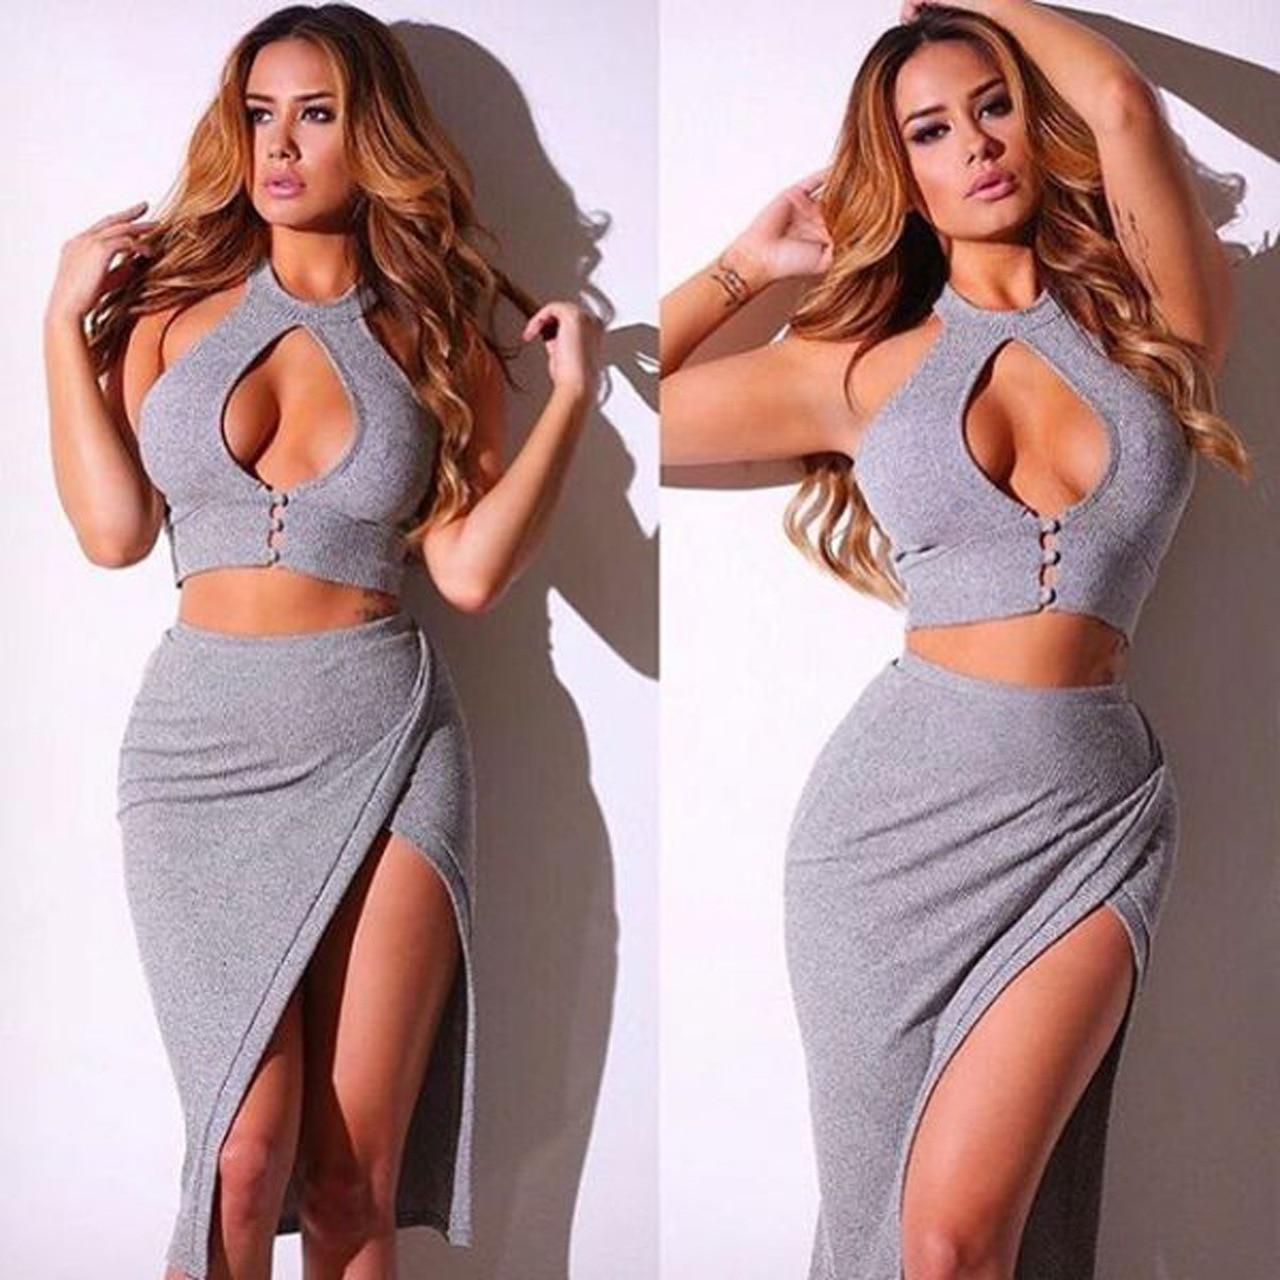 2017 Sexy Bodycon Kim Kardashian Big Ass Dress For Sex Open Leg Sleeveless Women Two Piece Women Night Clubbing Sex Party Dress In Dresses From Womens